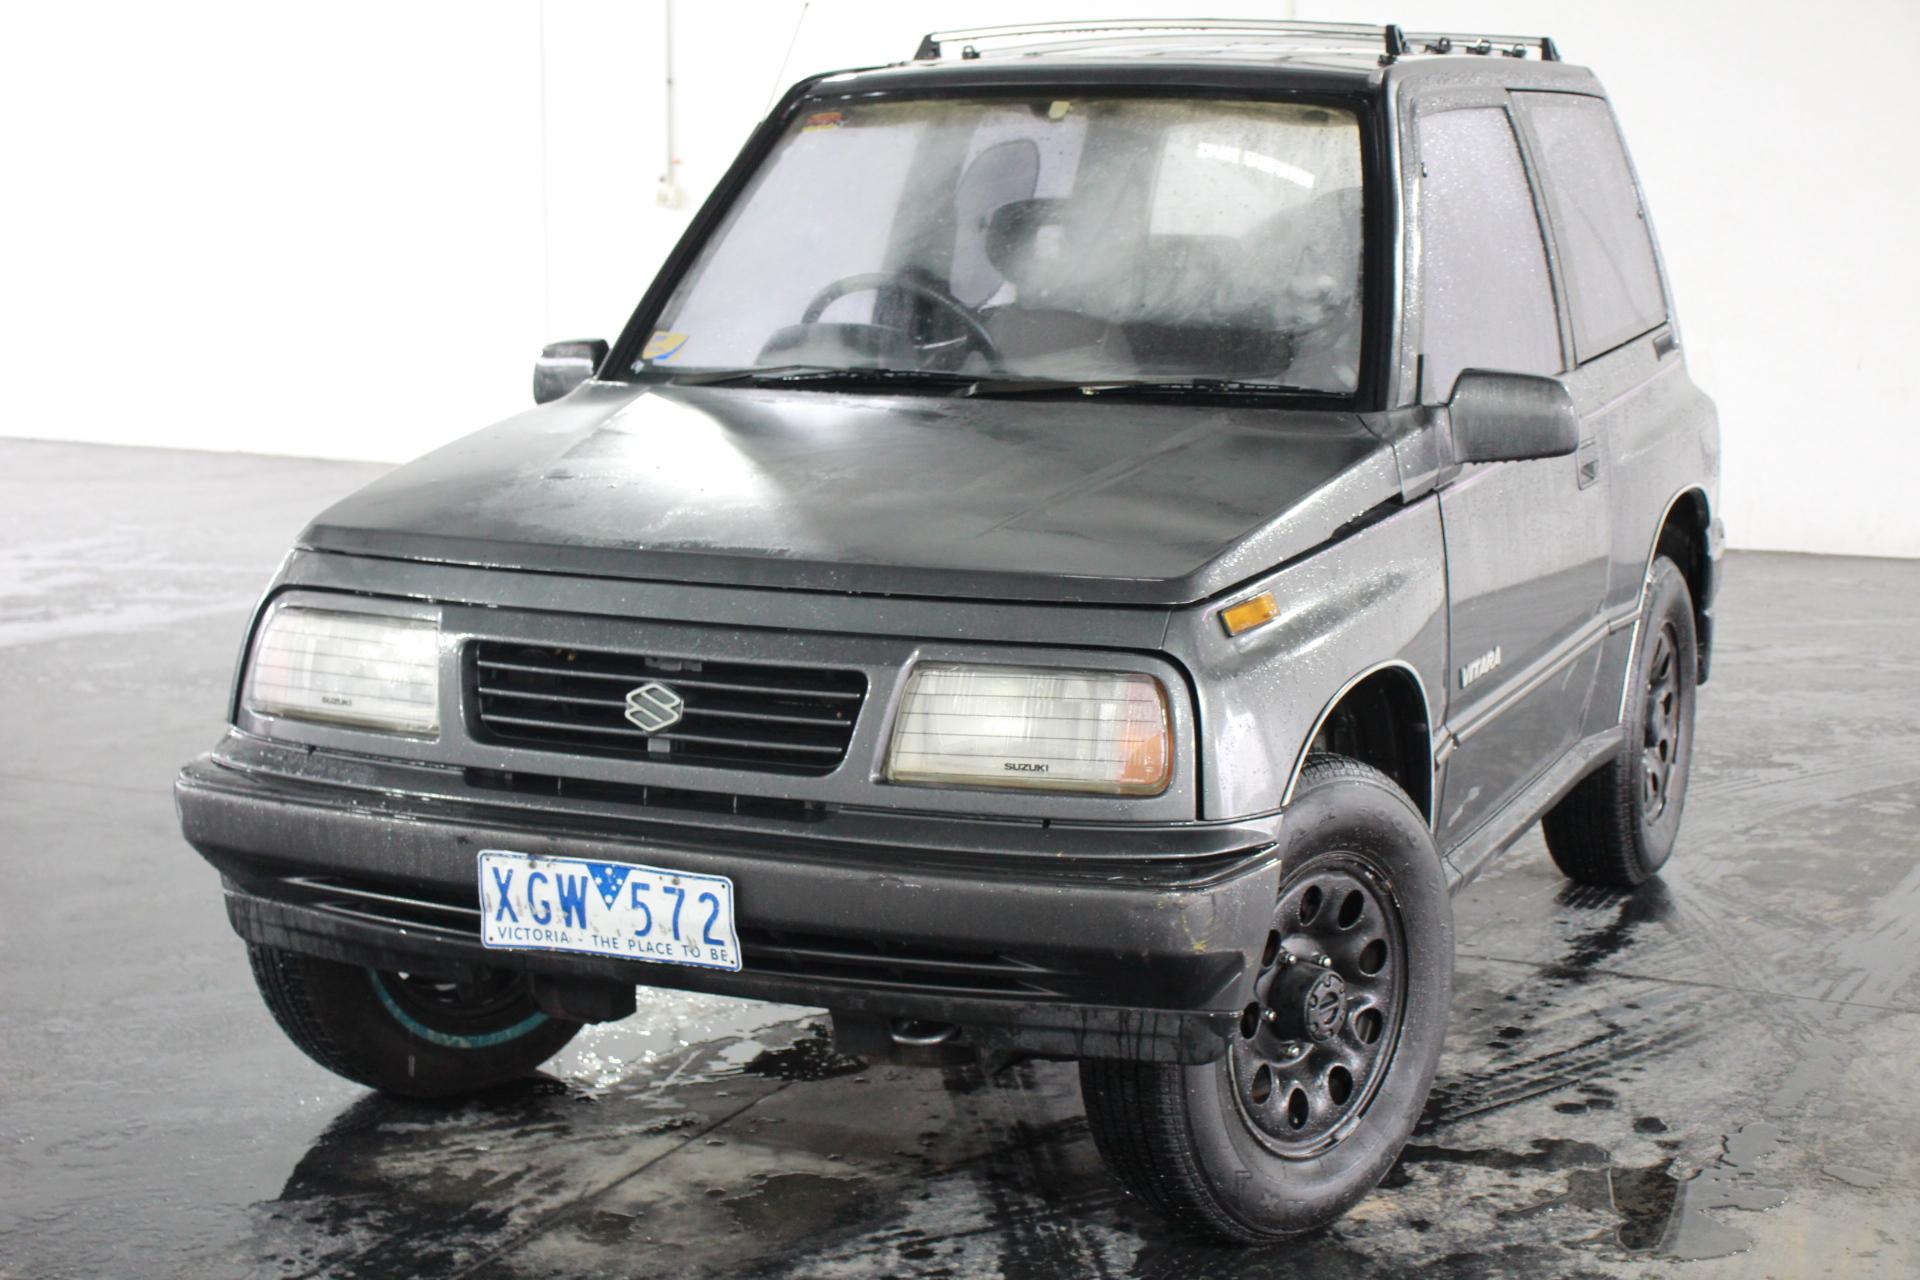 1989 Suzuki Vitara Manual Coupe